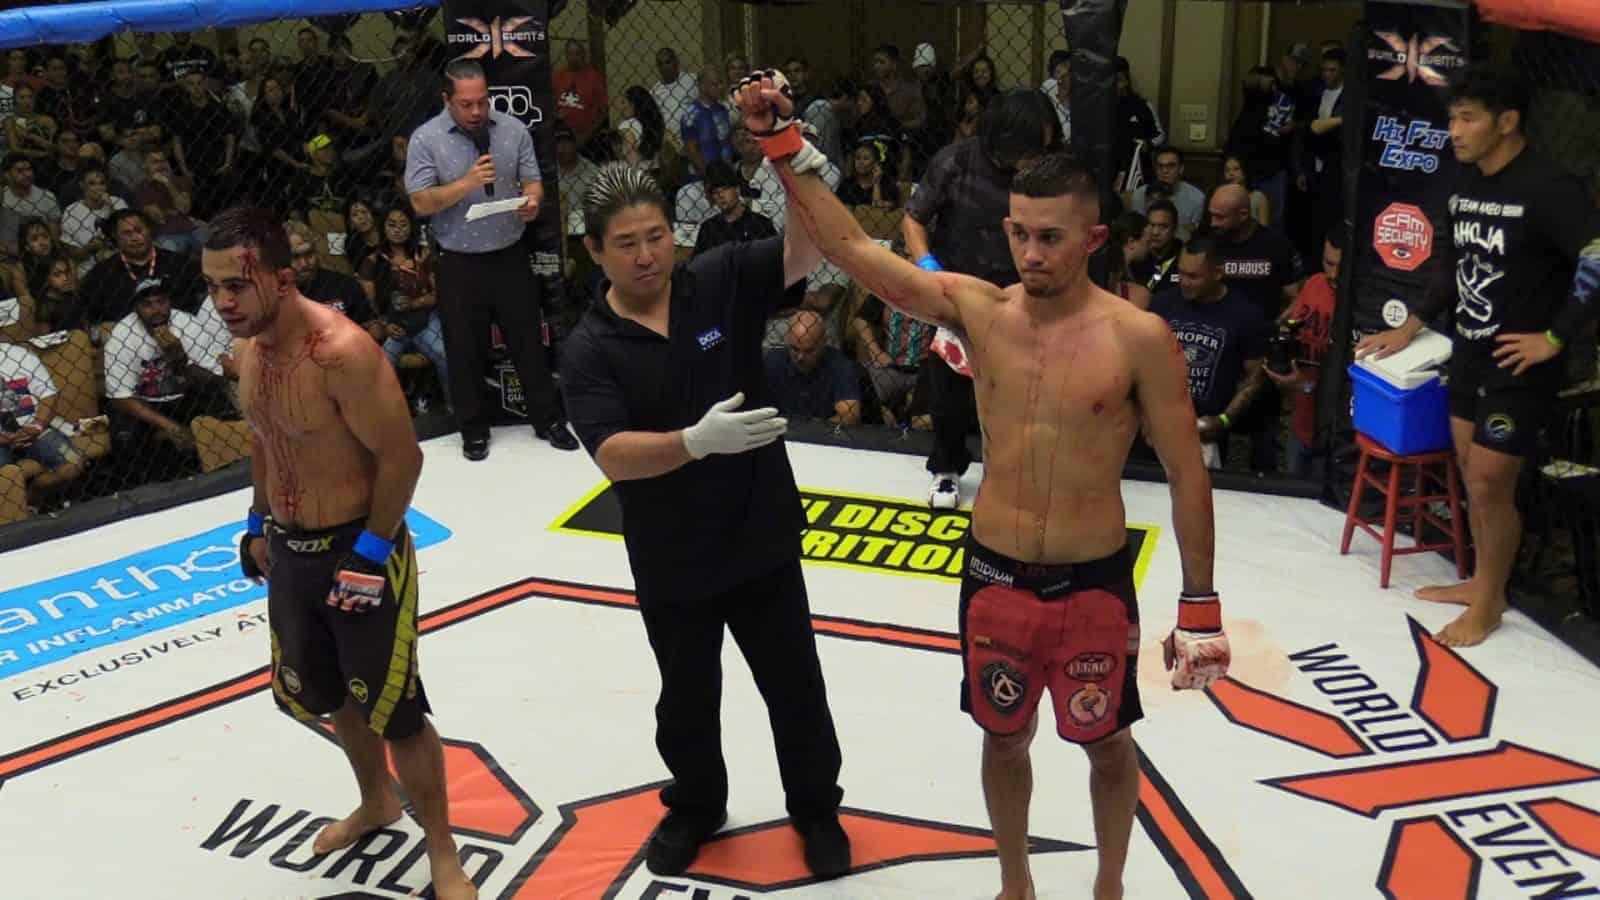 Braydon Akeo defeated Jonah Estrella via TKO - Doctor Stoppage